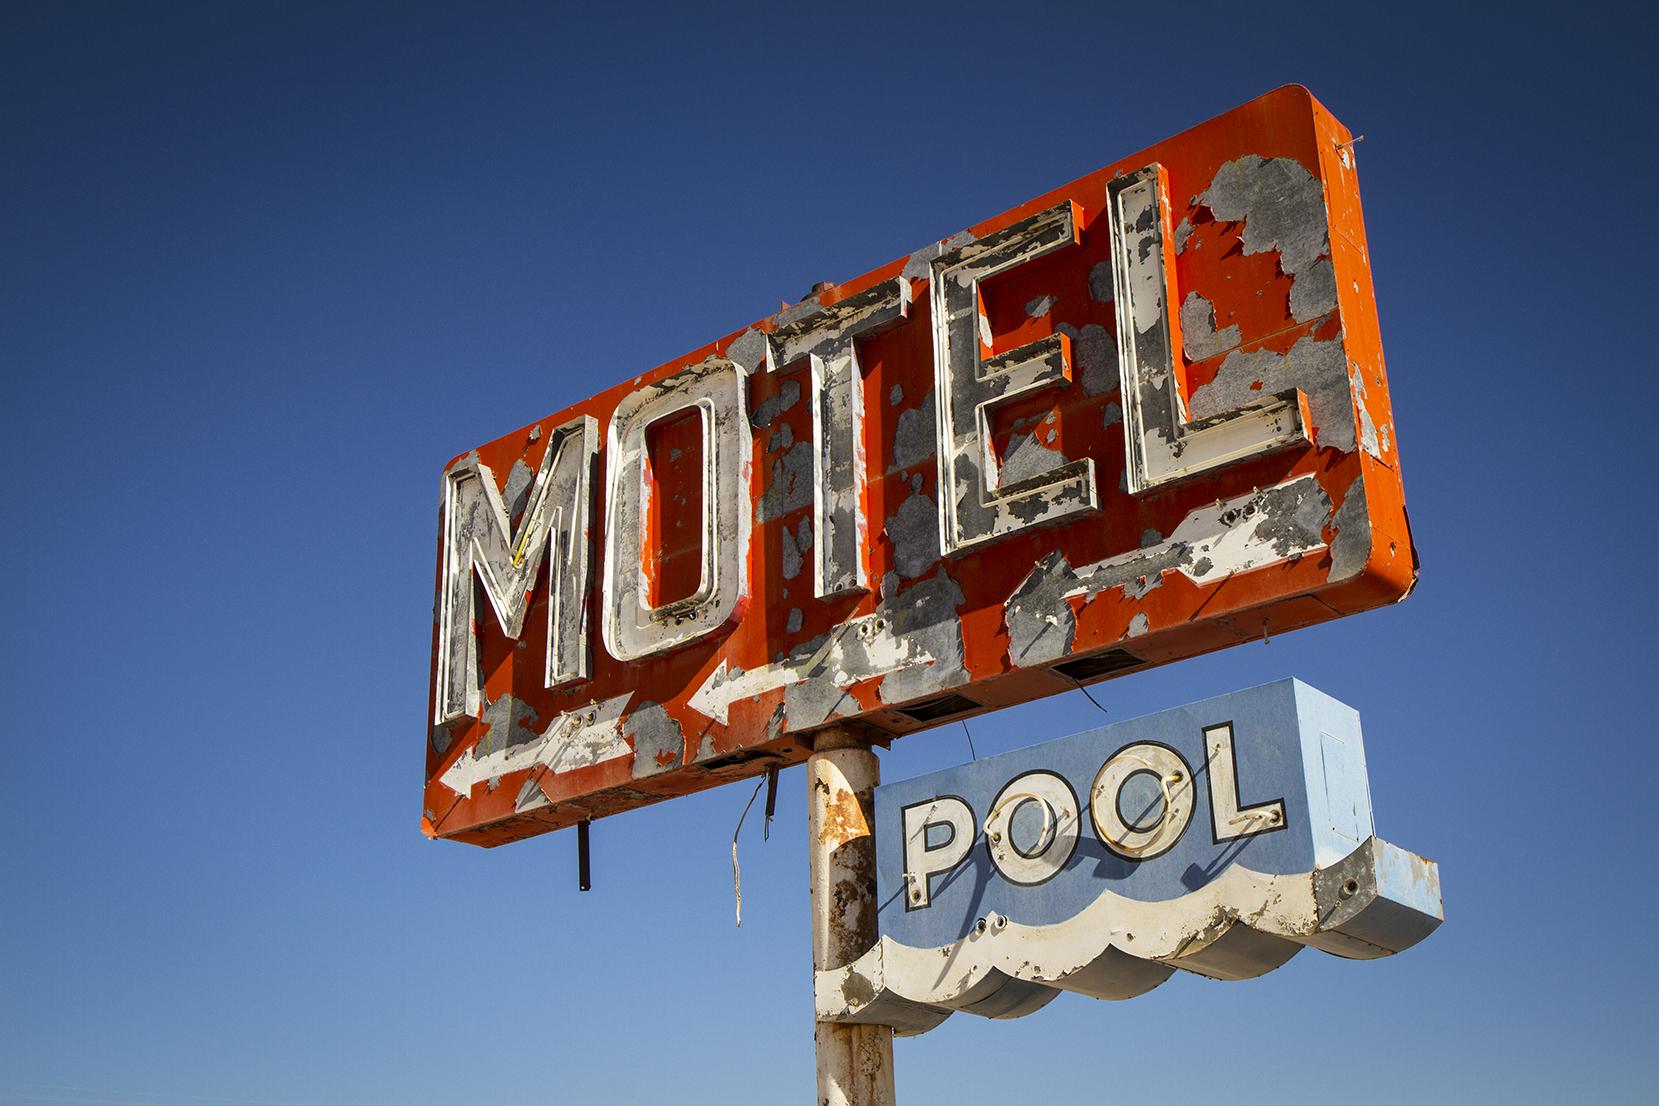 Empty Pools. Yucca, AZ 2013